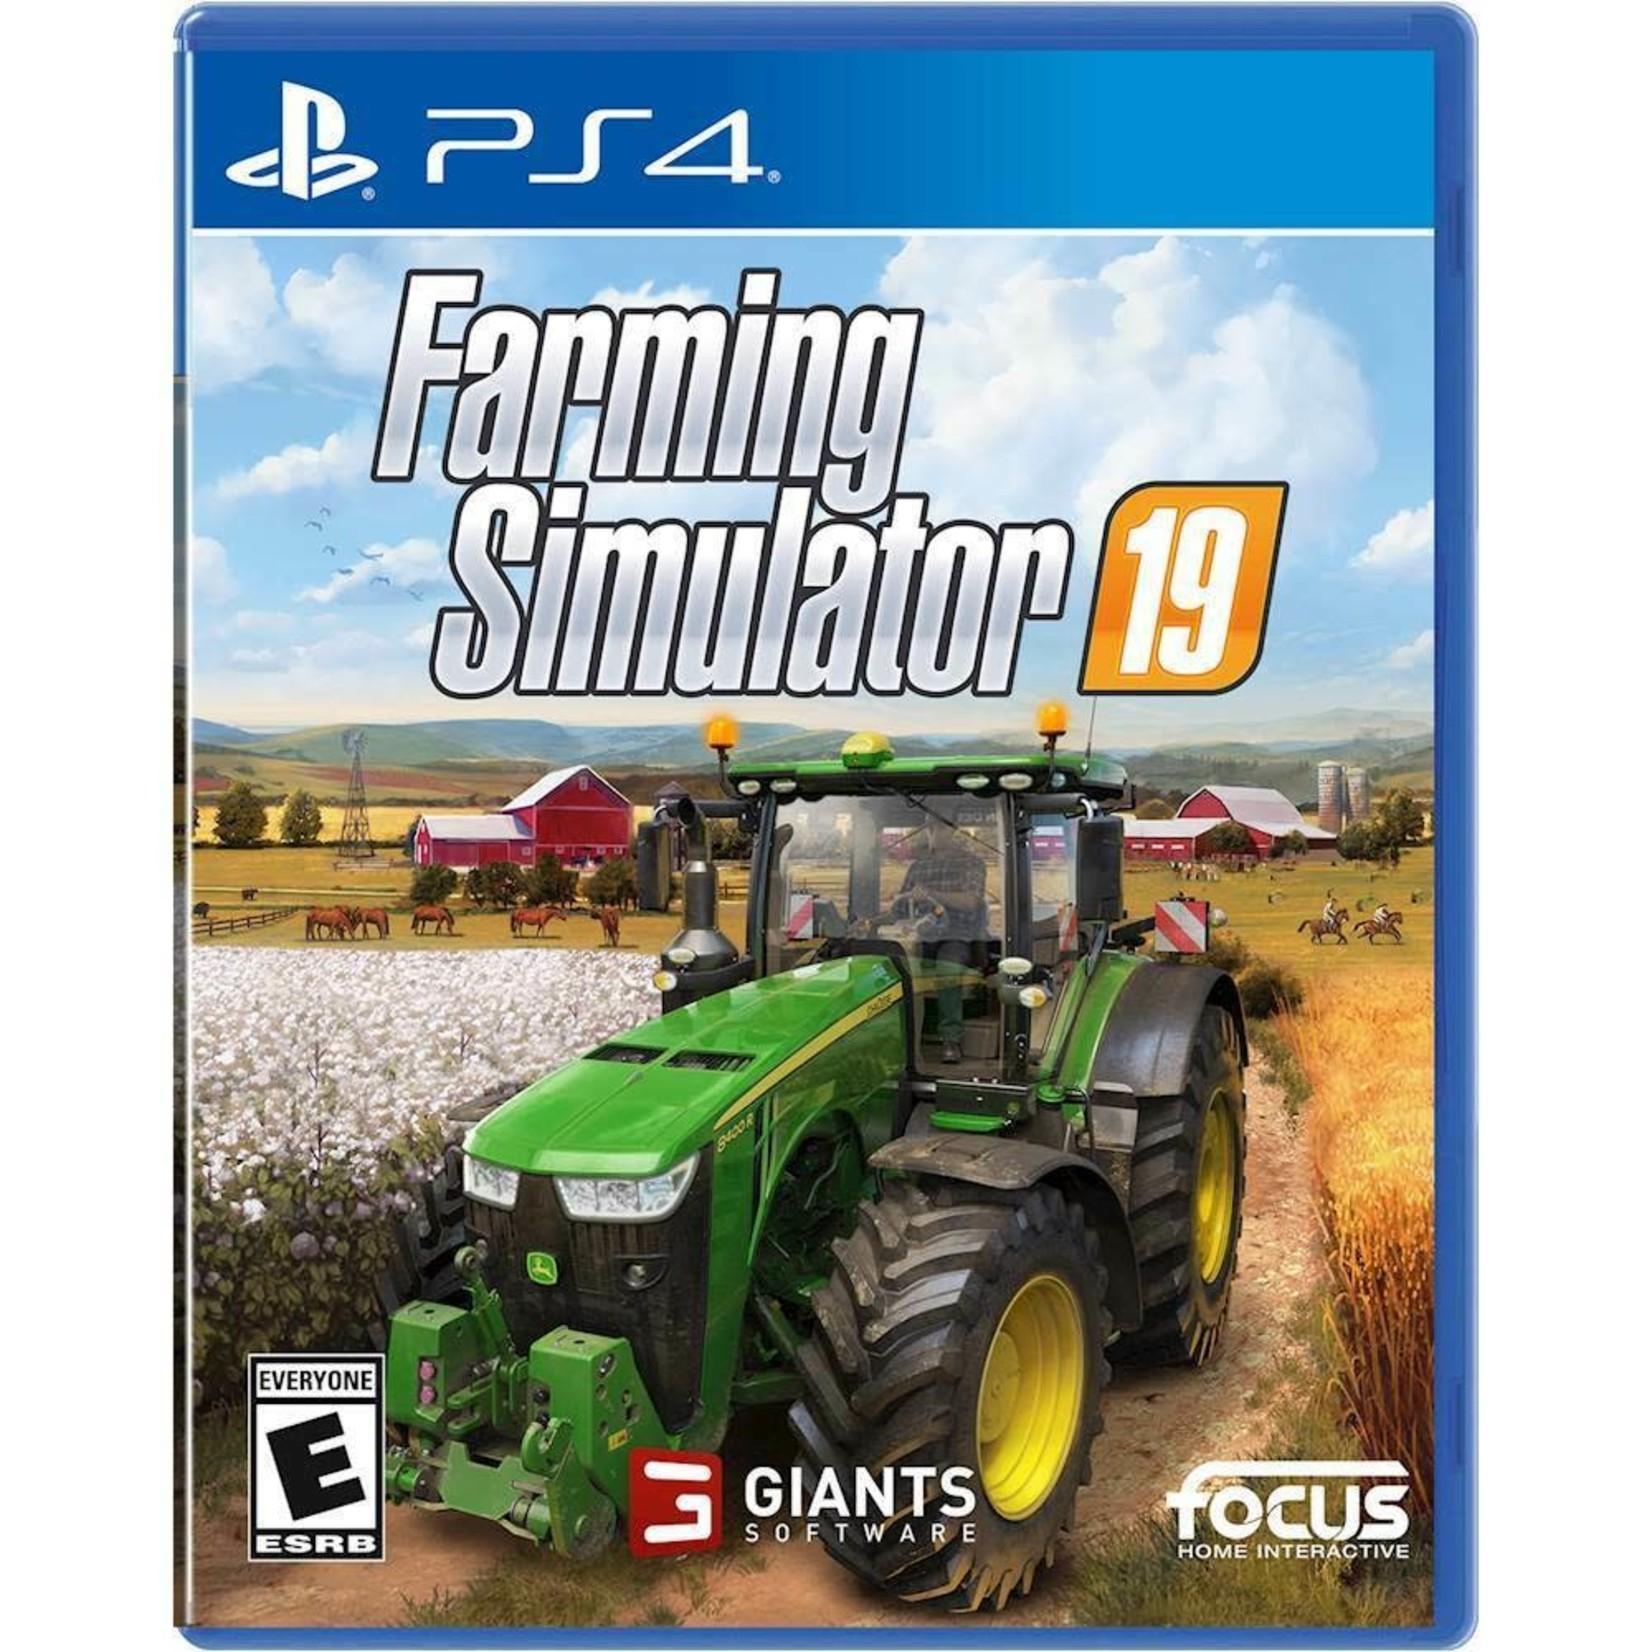 PS4U-Farming Simulator 19